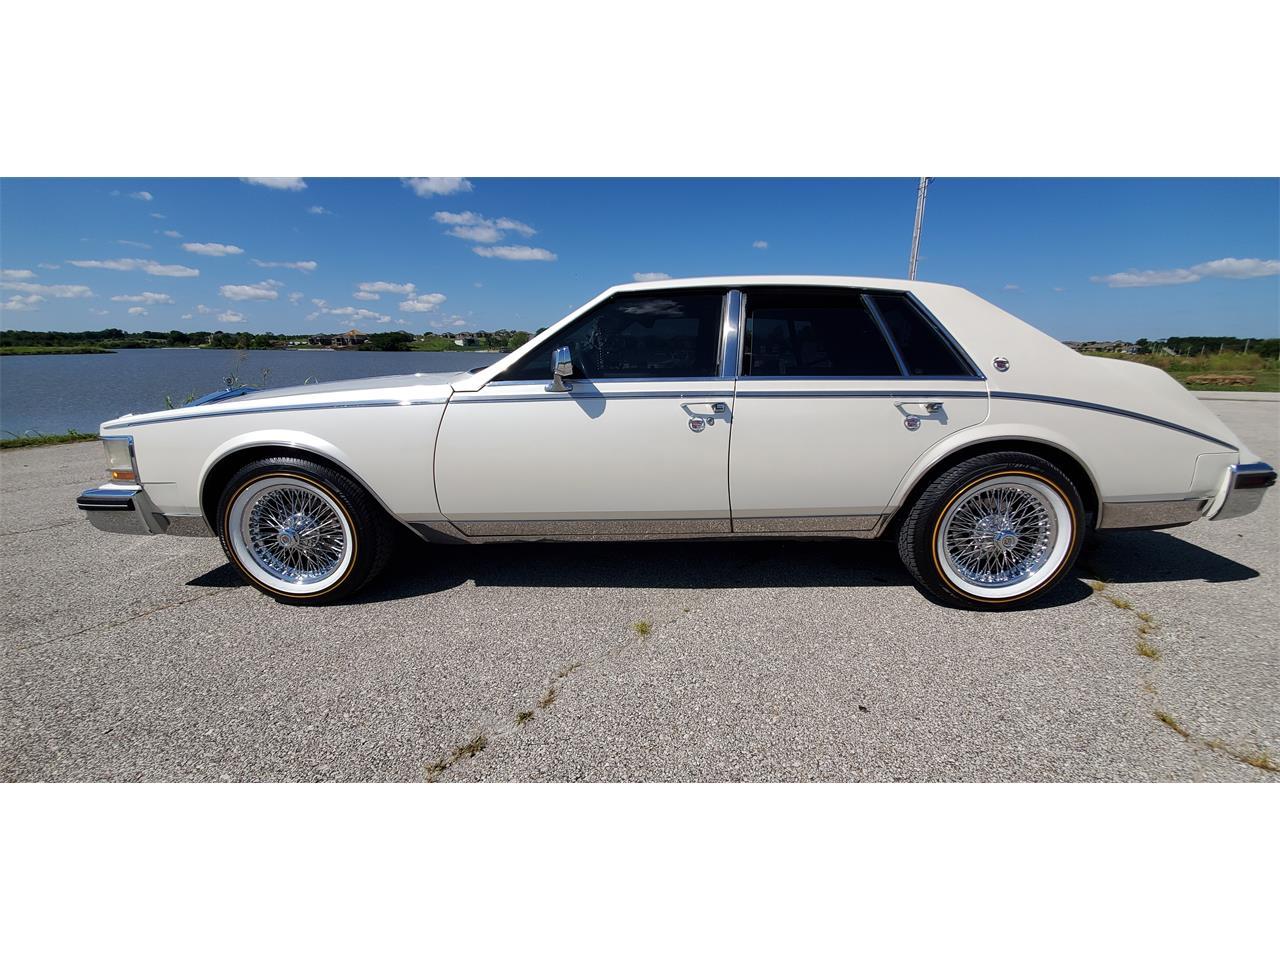 Large Picture of '83 Cadillac Seville located in Missouri - $10,000.00 - QJQR